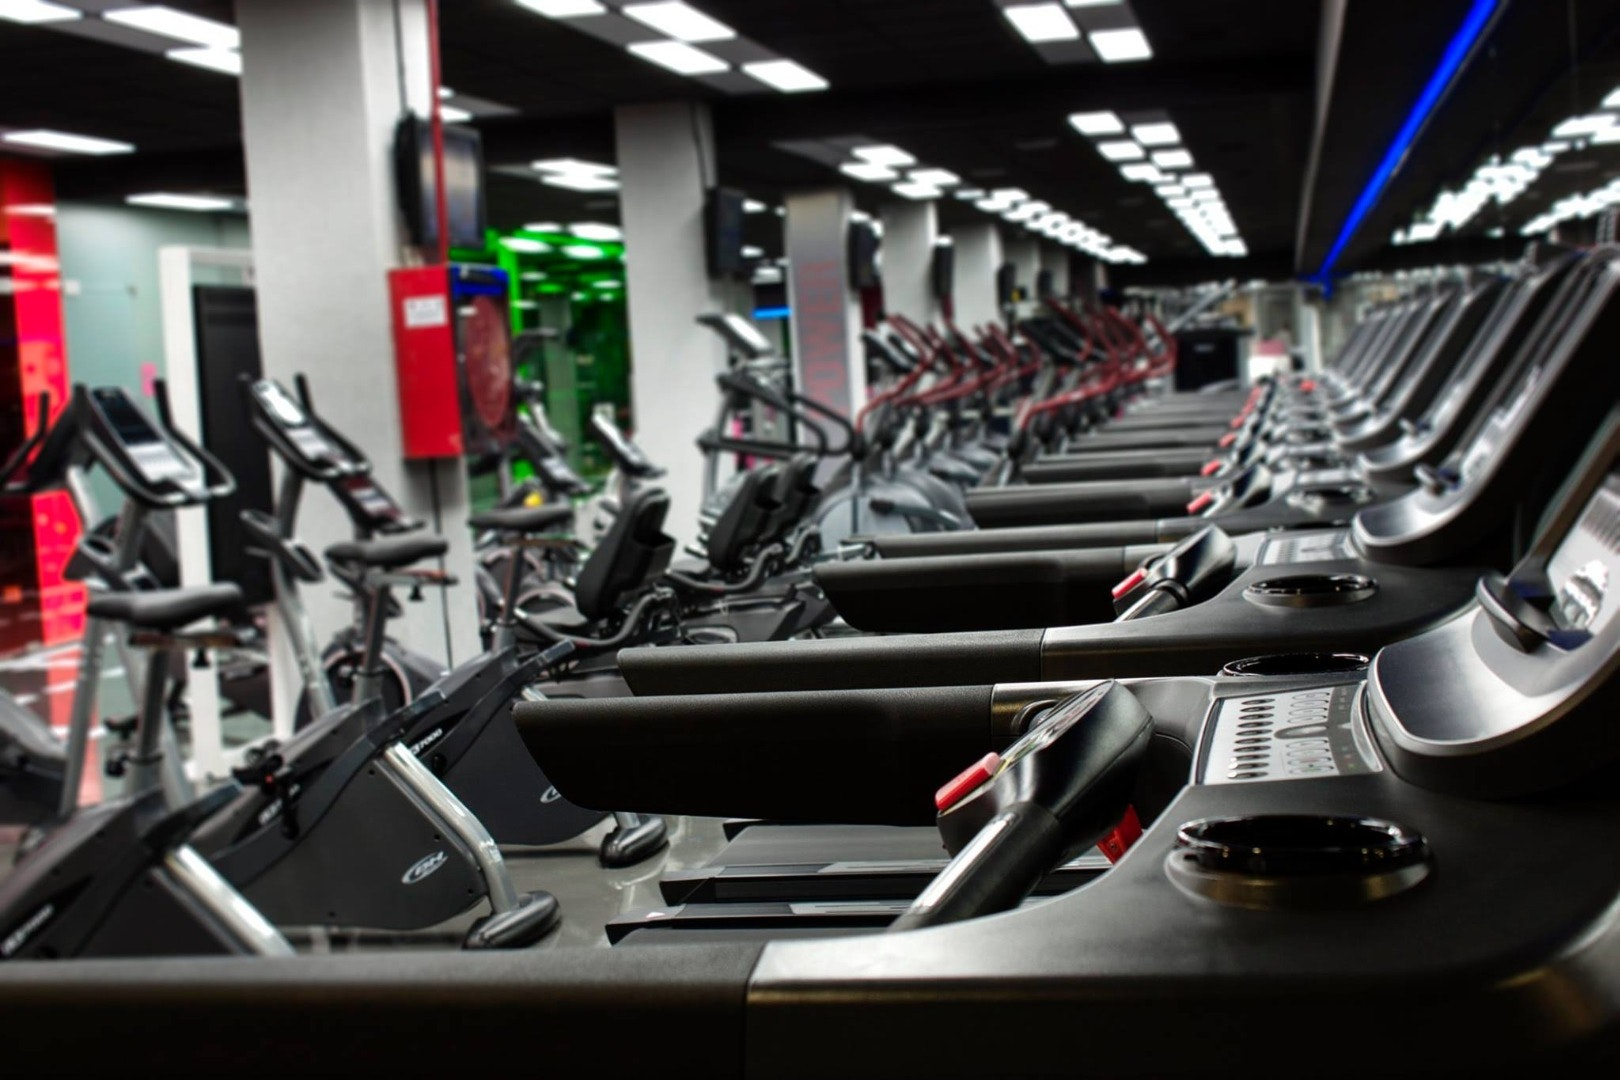 Foto 0 Oferta Hi Fitness Río Madrid {2} - GymForLess